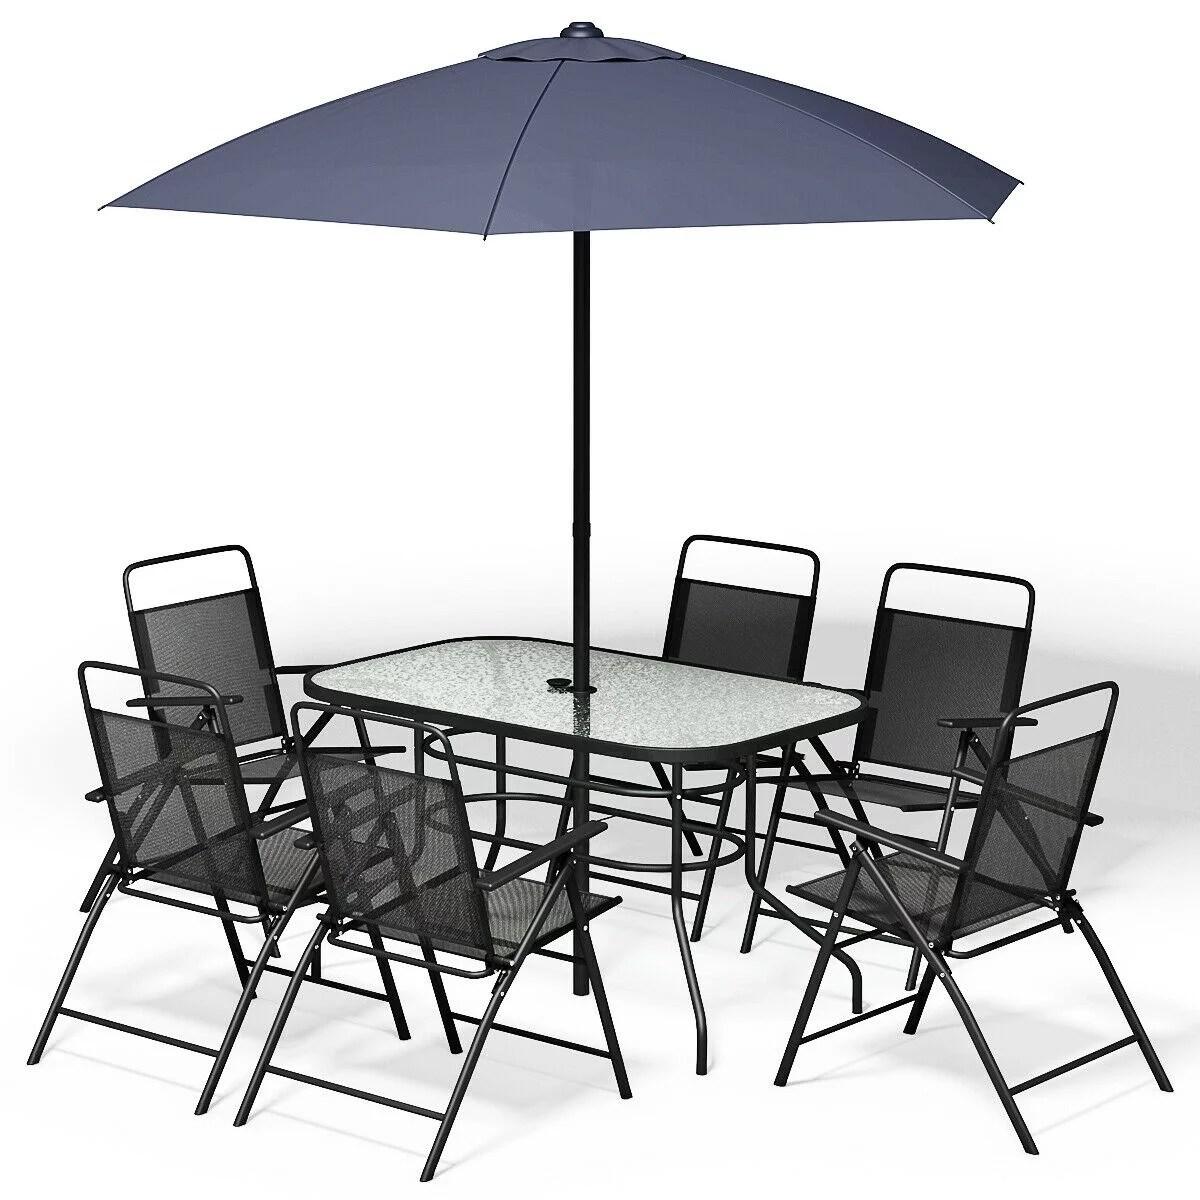 8pcs patio garden set furniture 6 folding chairs table with umbrella gray new walmart com